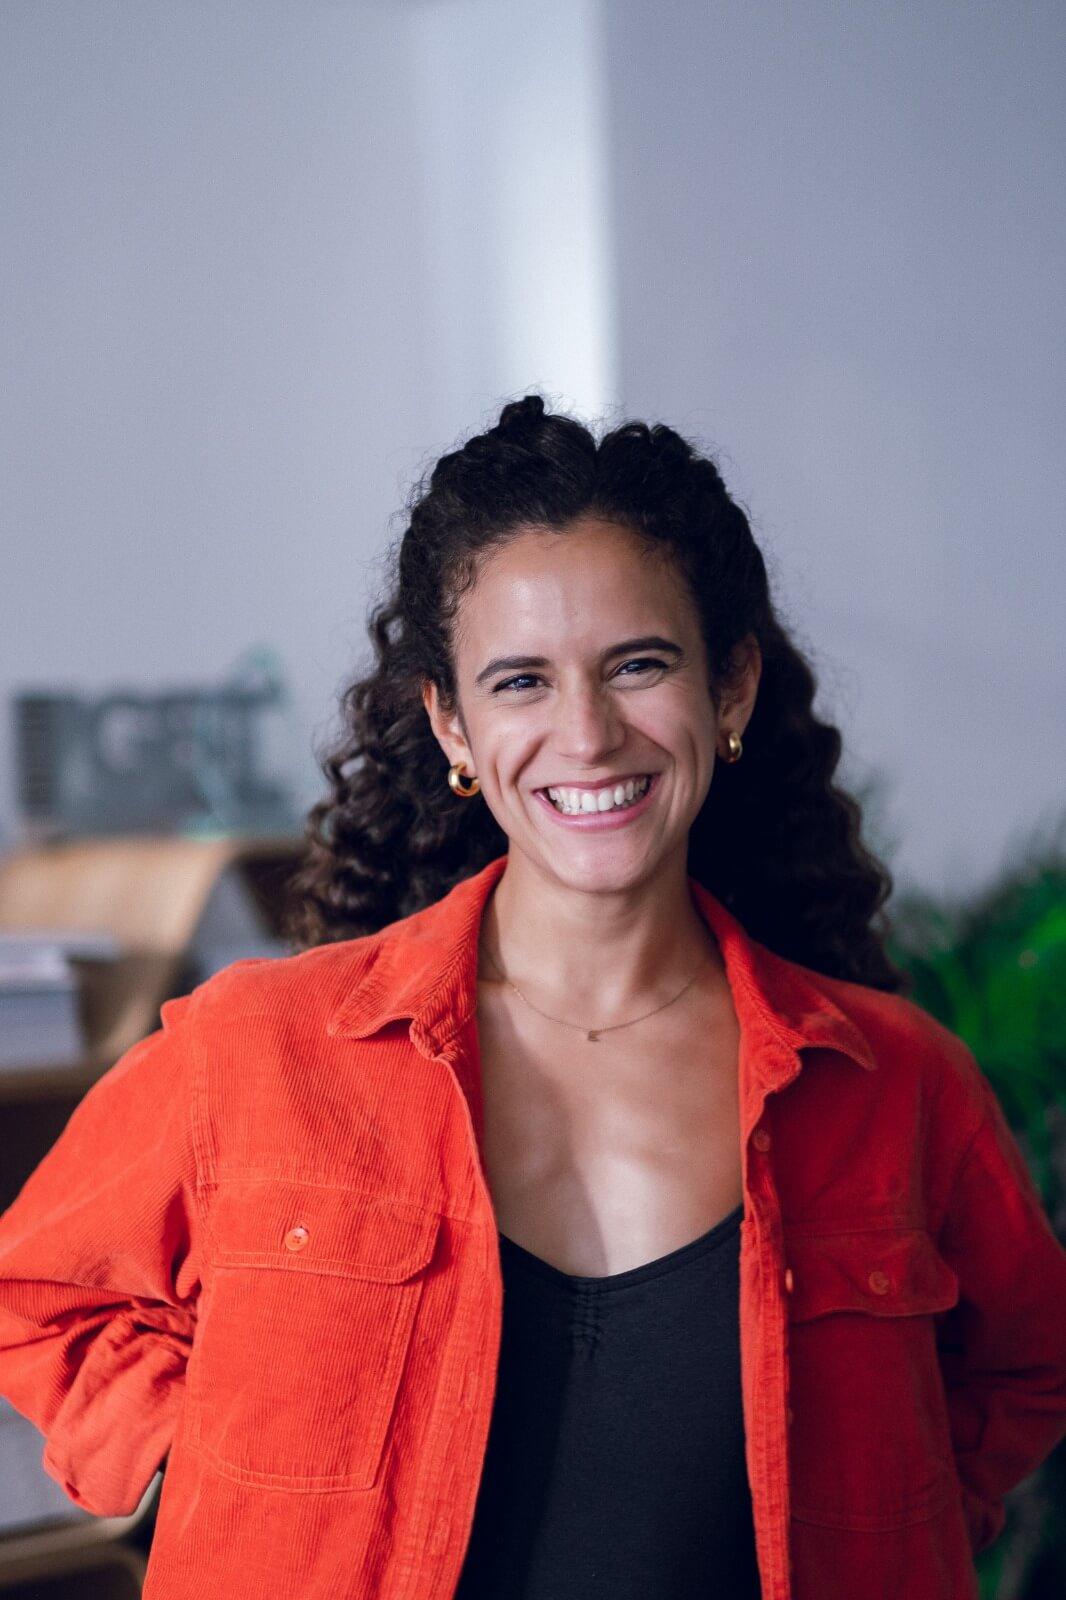 Writer and Editor Leah Cowan